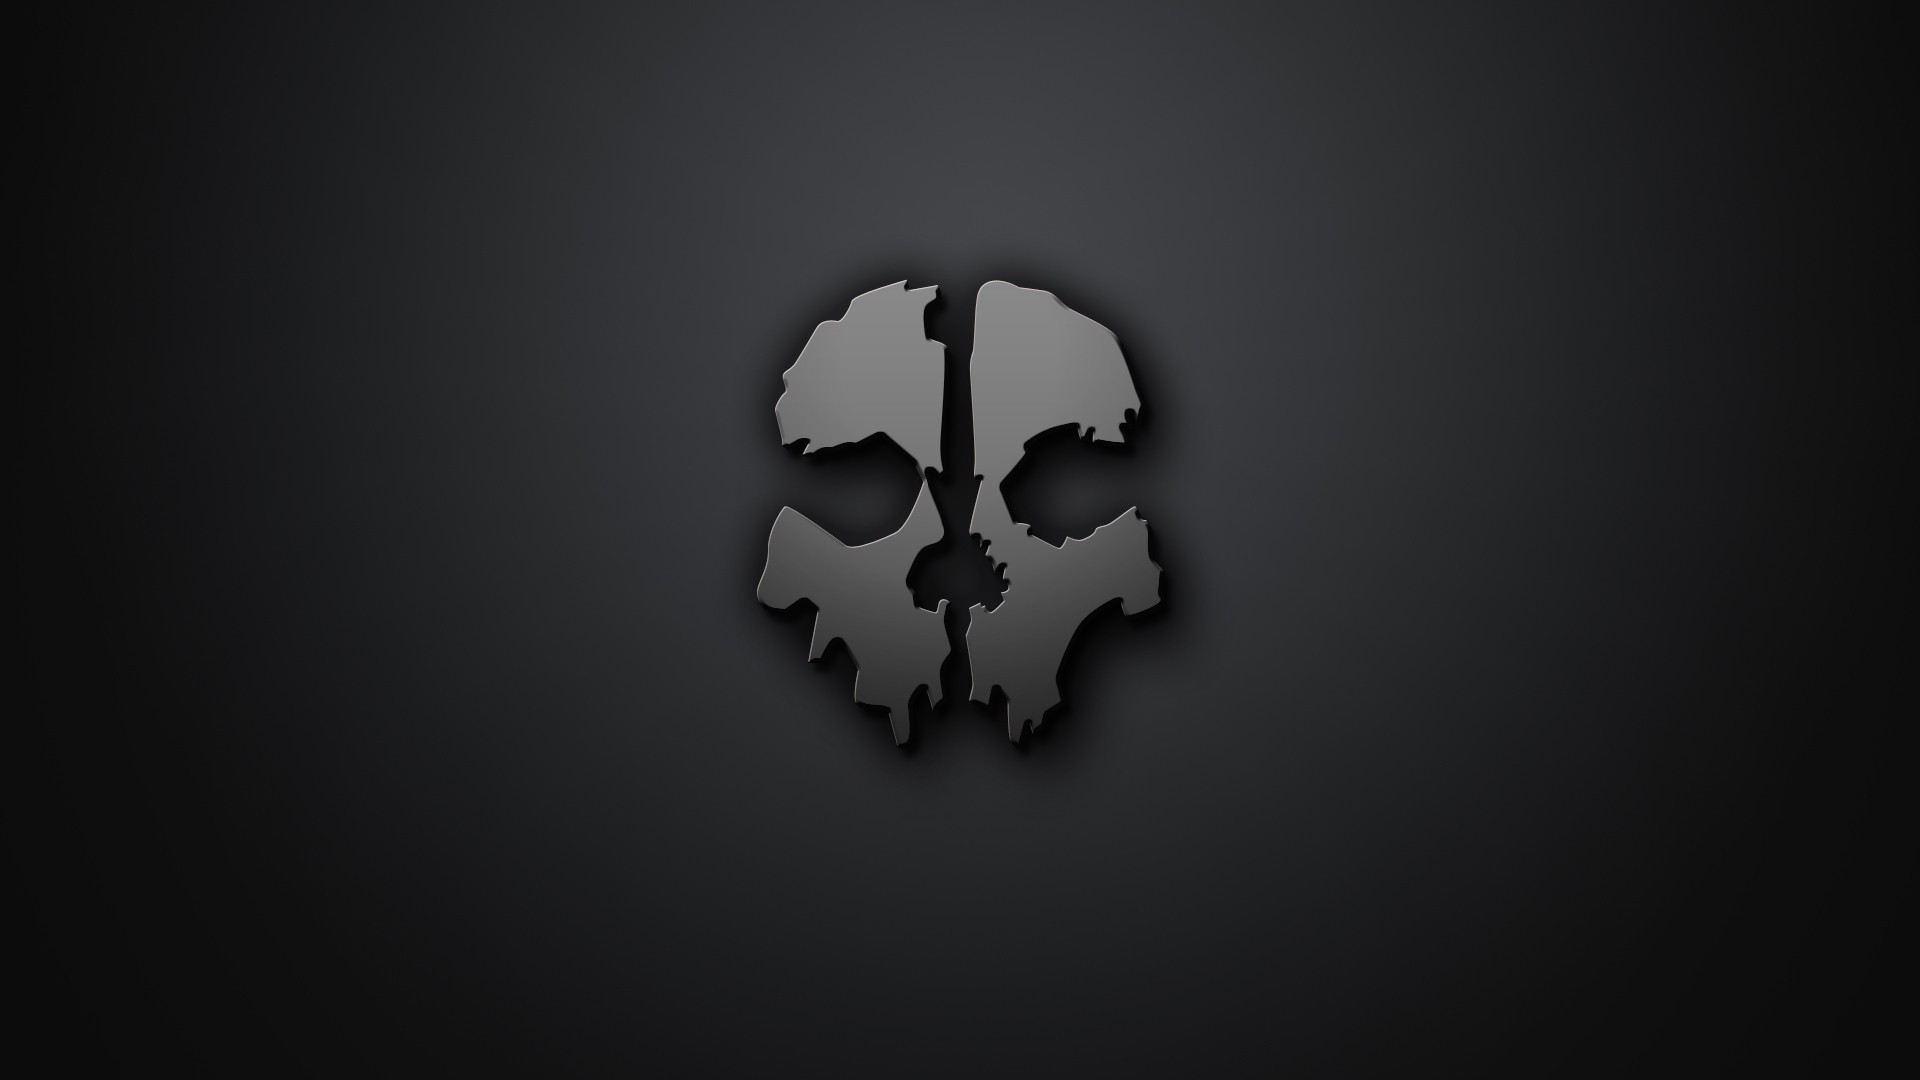 Halo Reach 3d Wallpaper Pc Skull Artwork Minimalism Gray Background Call Of Duty